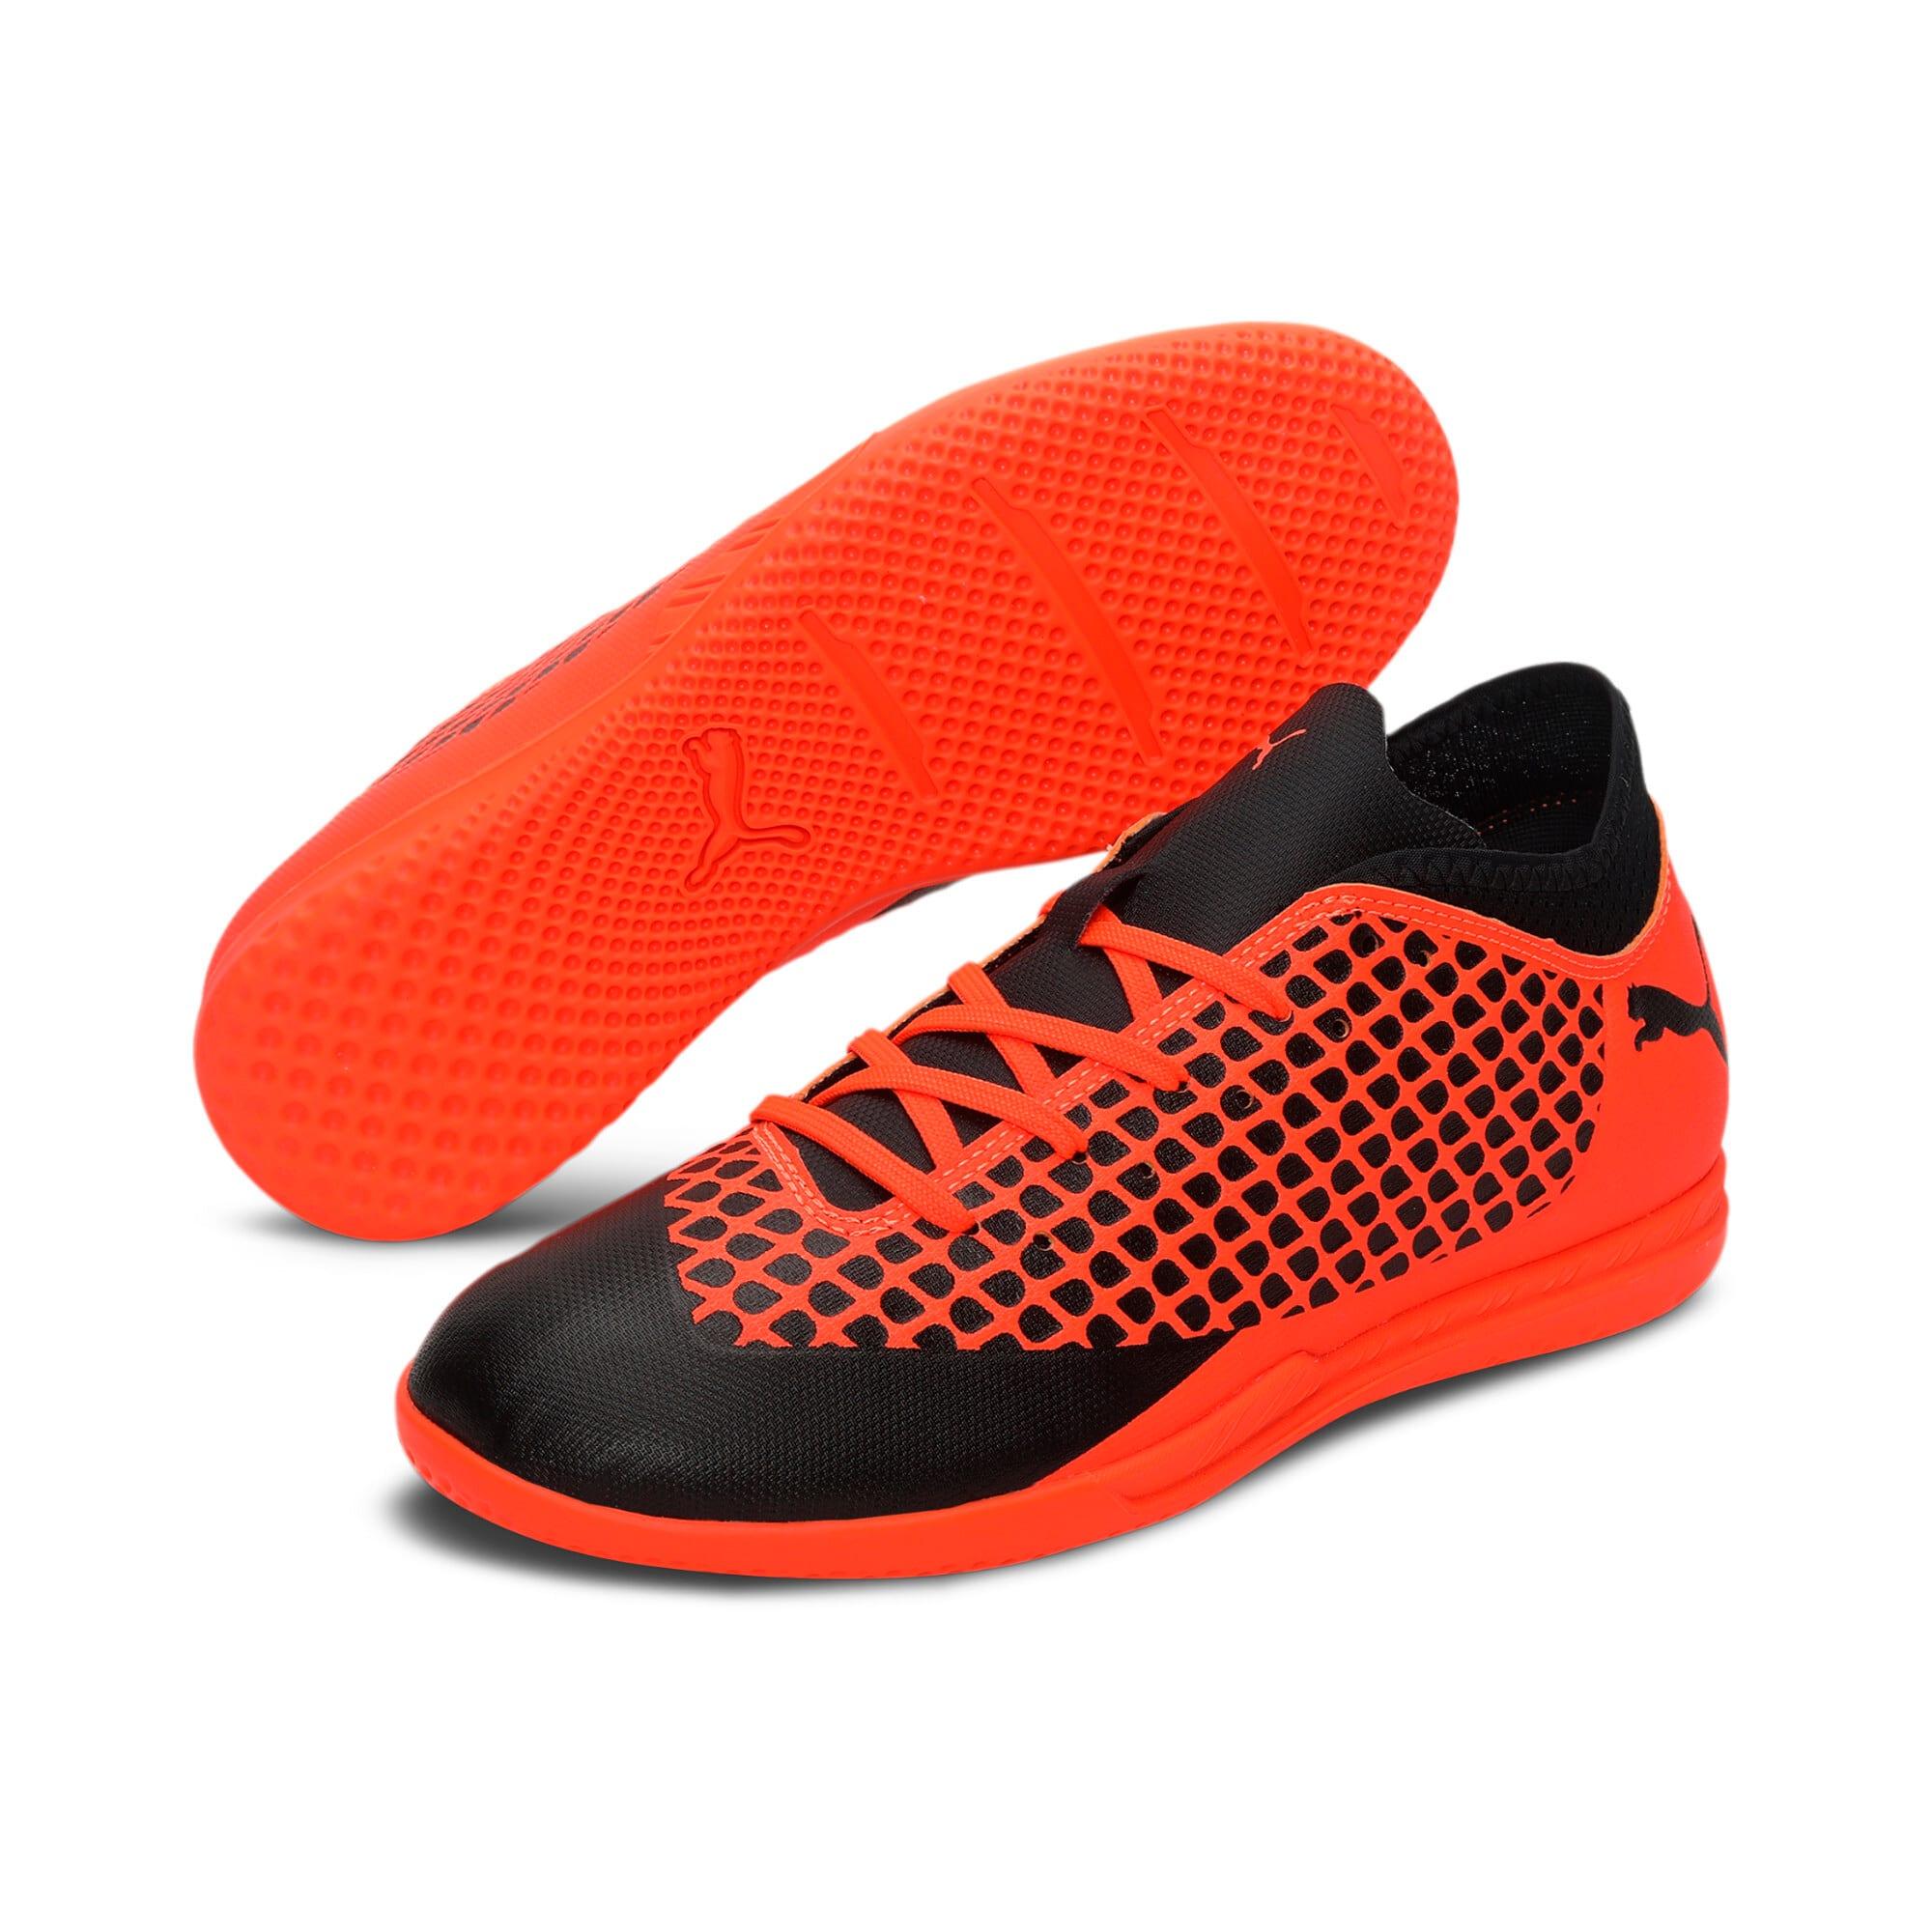 Thumbnail 2 of FUTURE 2.4 IT Kids' Football Shoes, Black-Orange, medium-IND